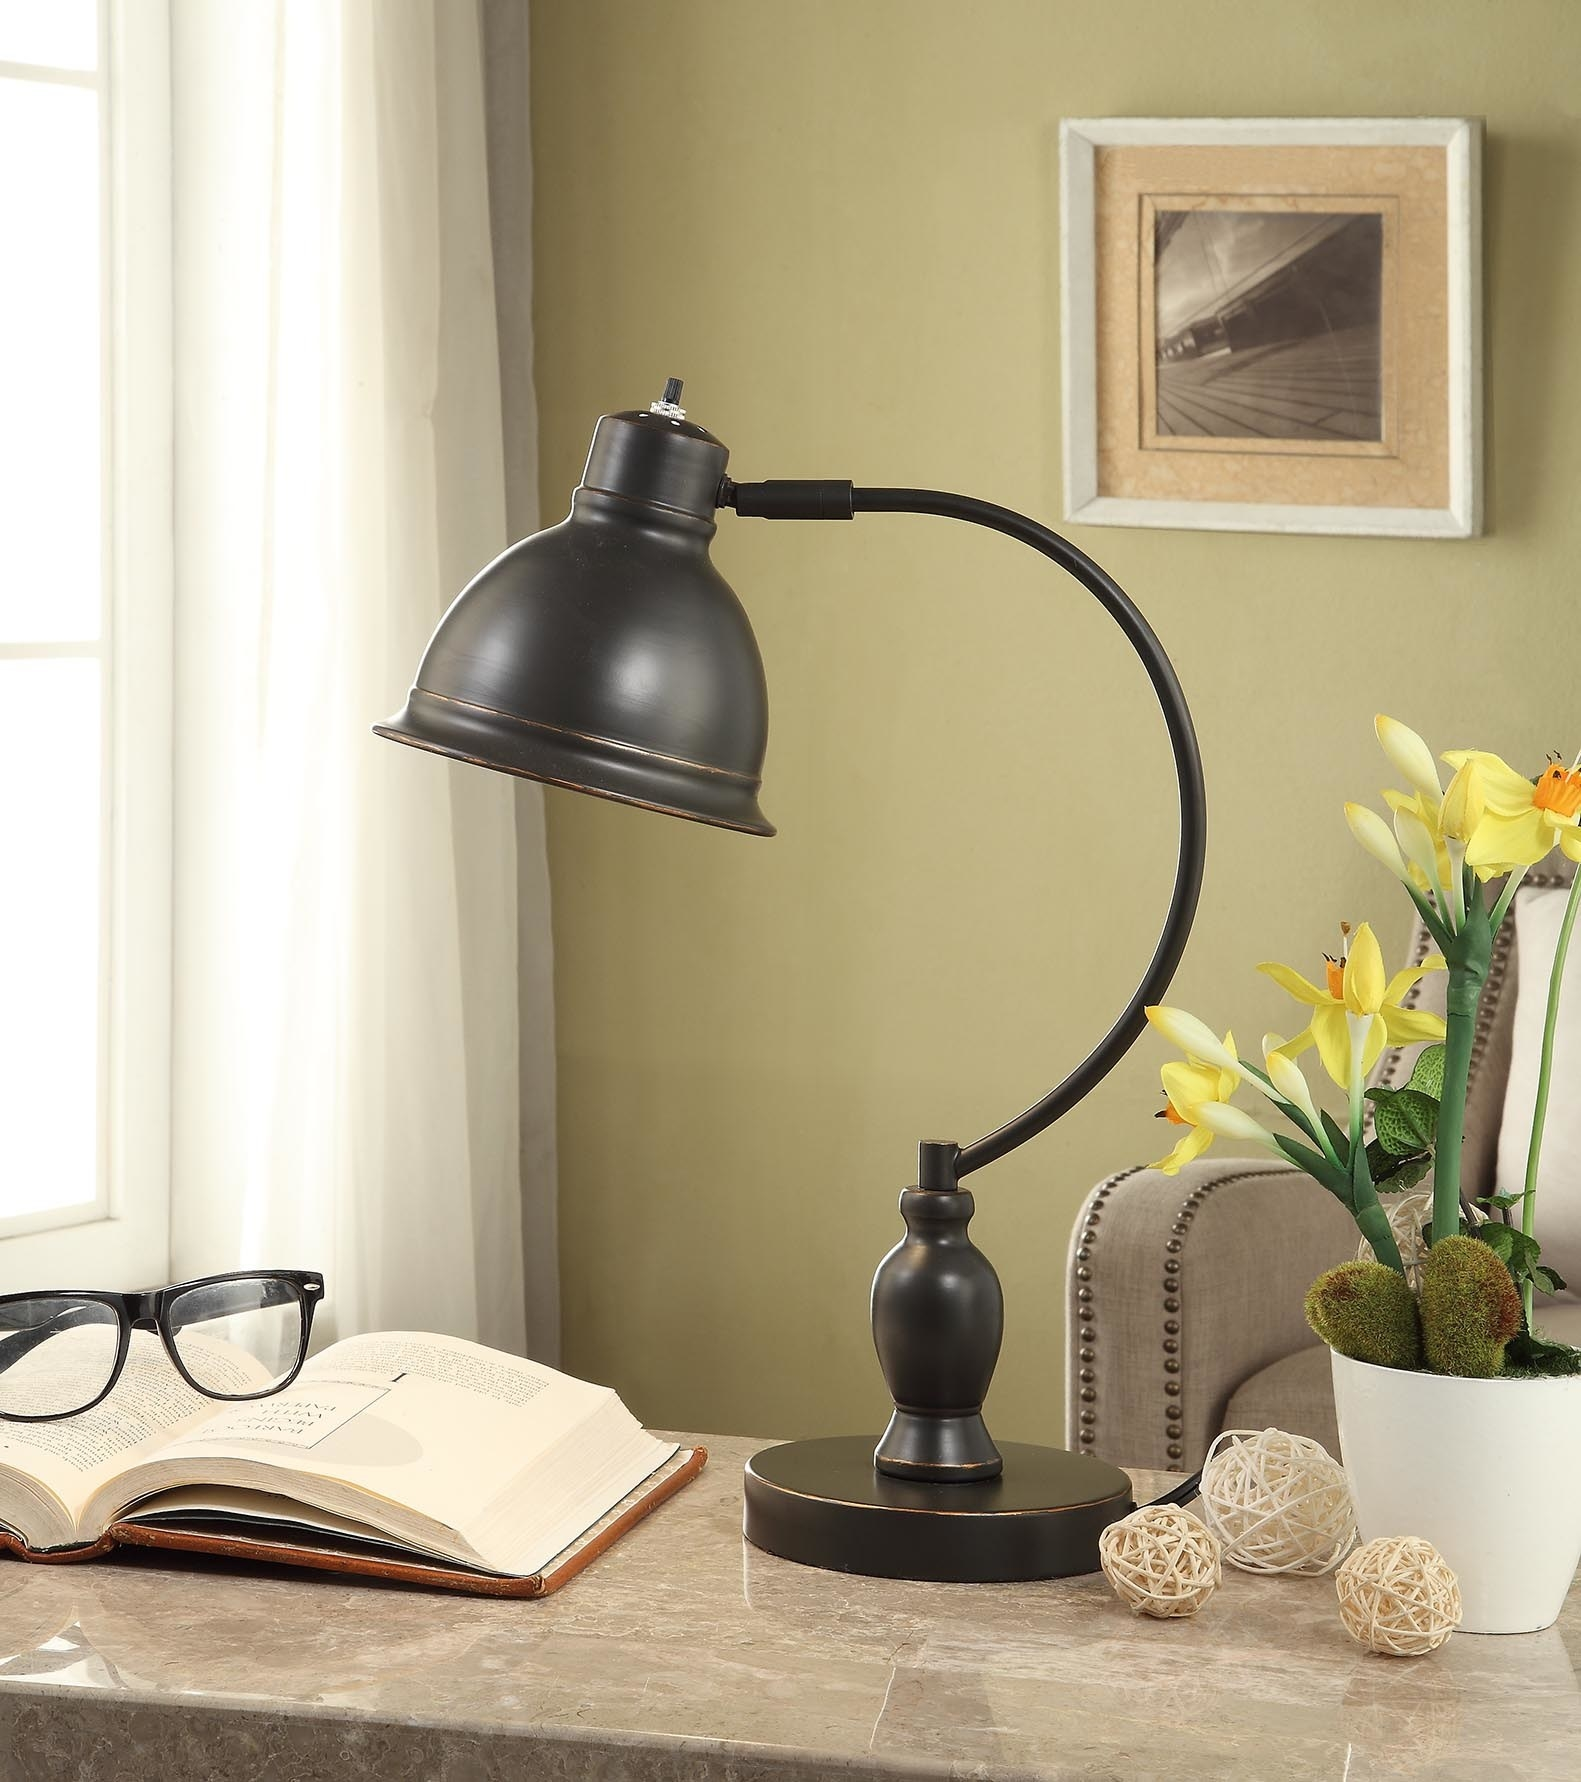 A traditional bronze light at a desk